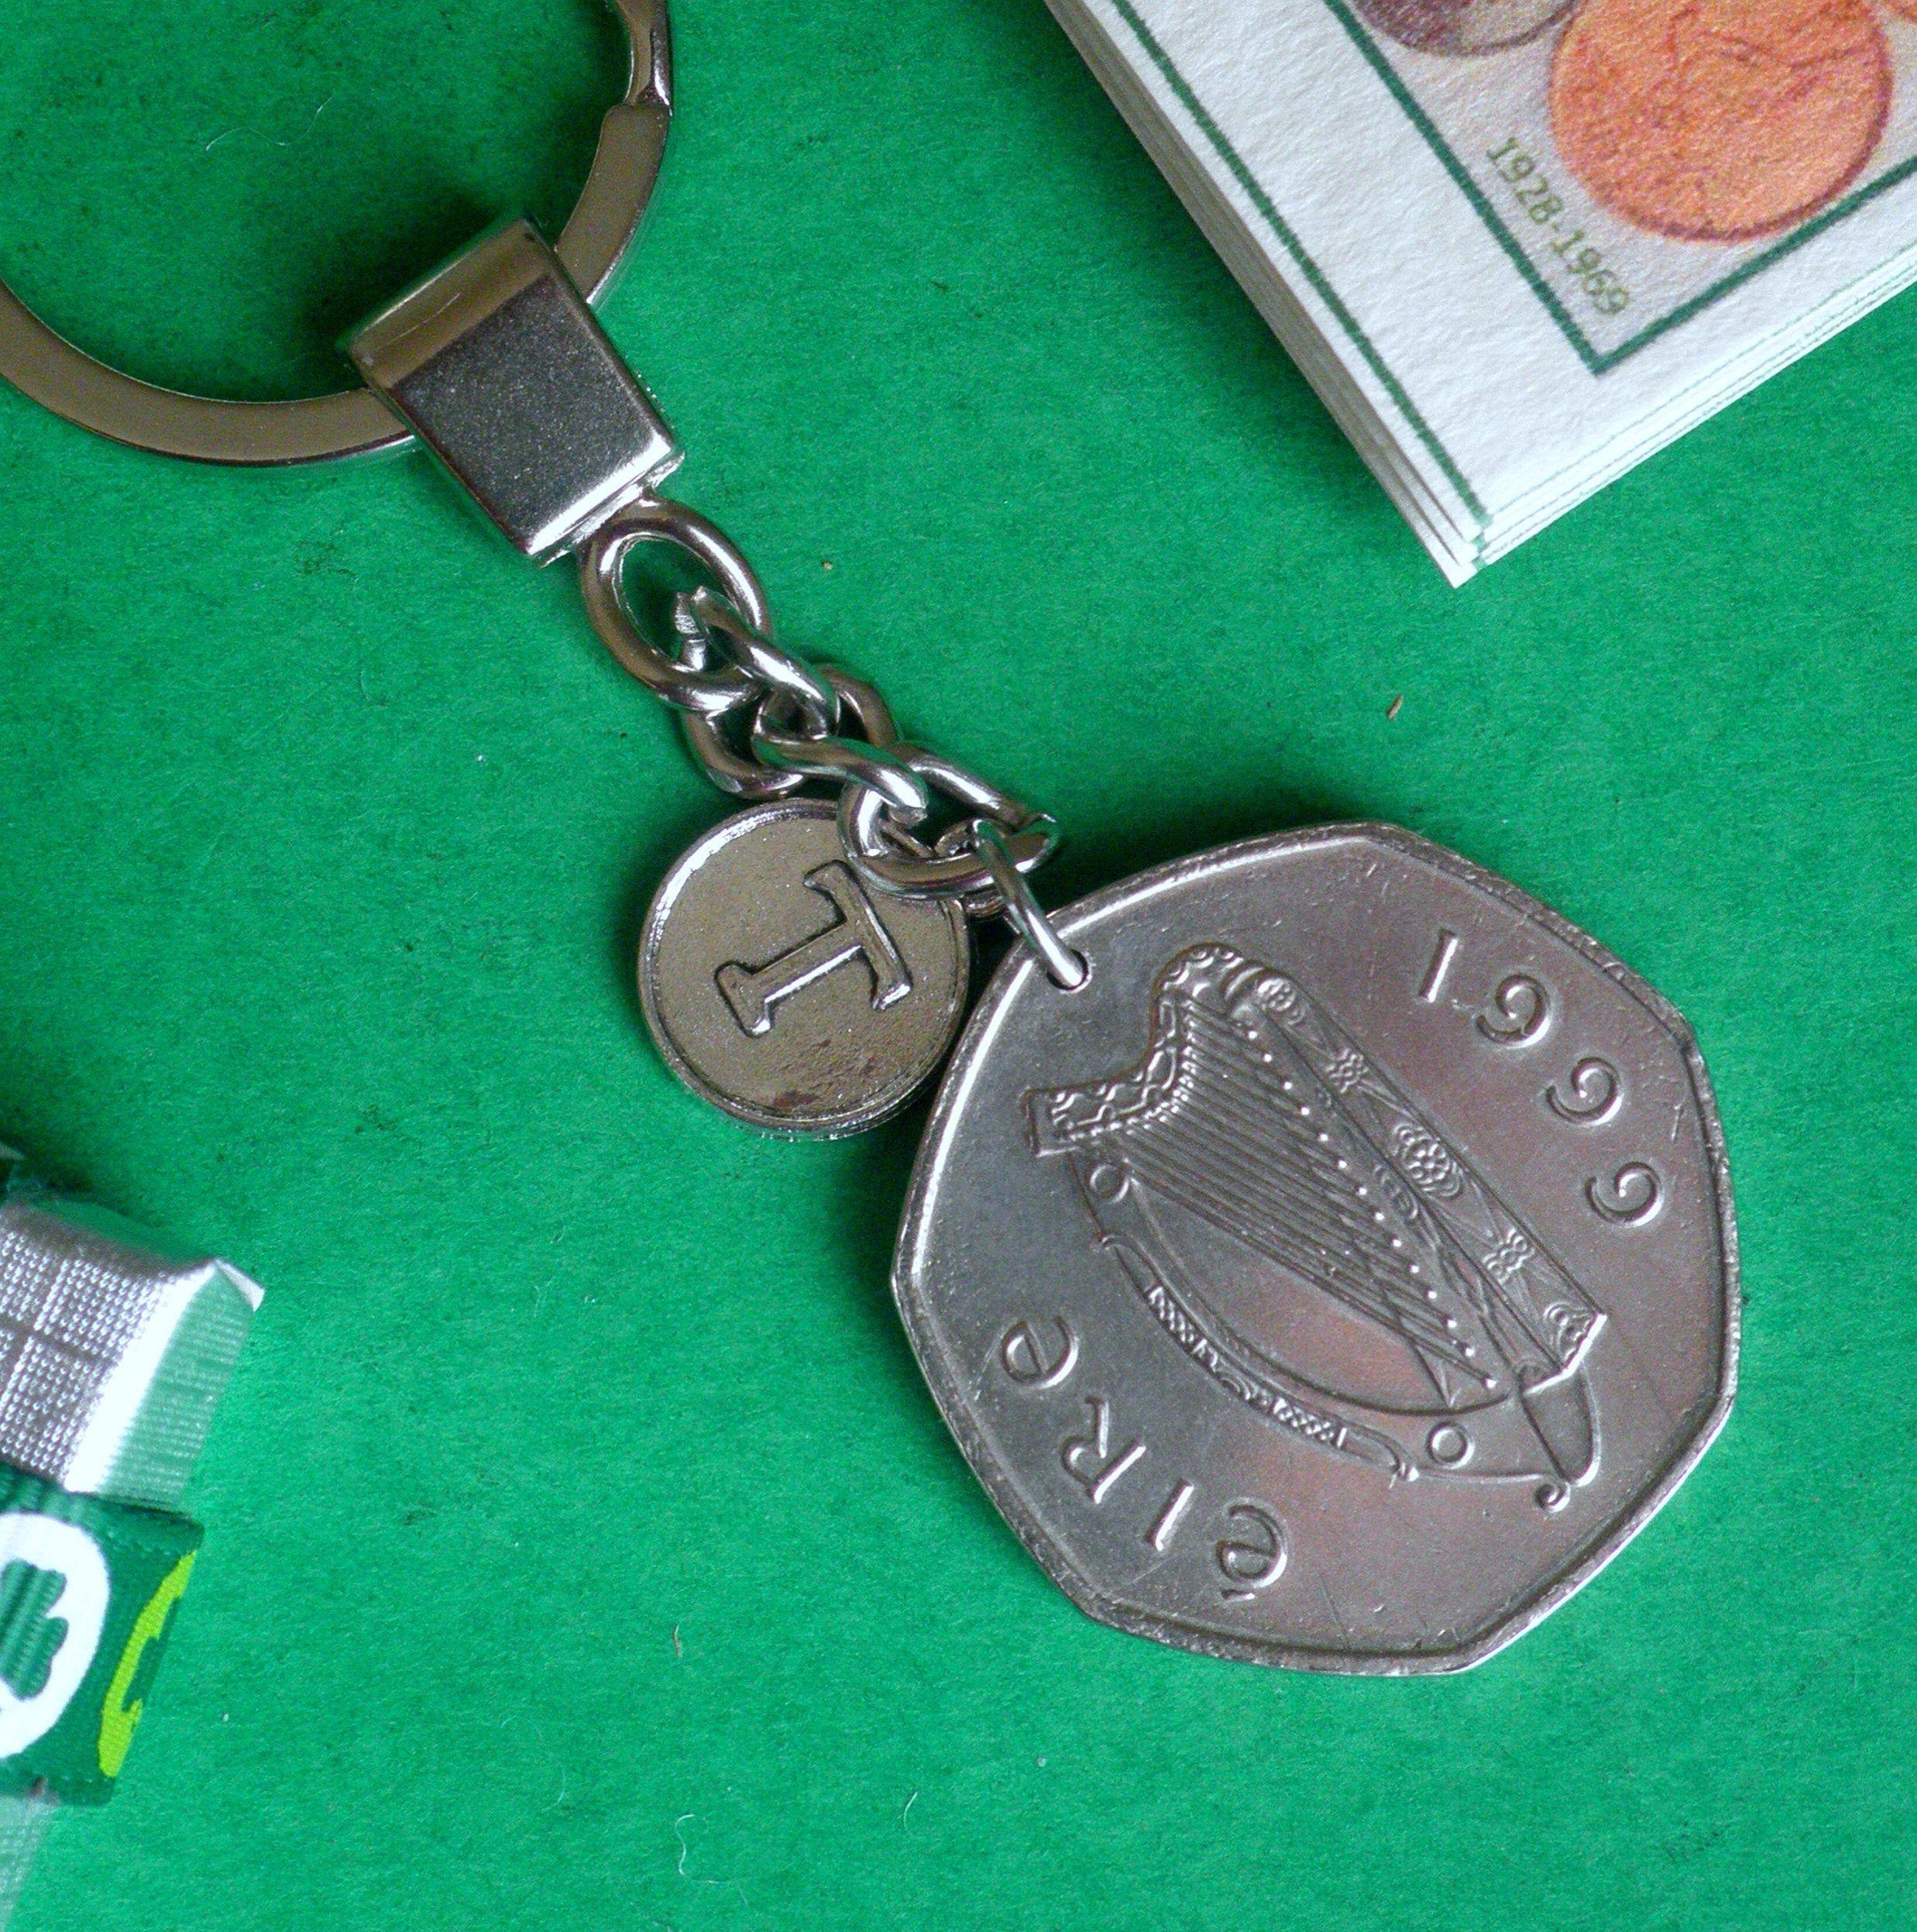 21st irish birthday customized keychain choice of